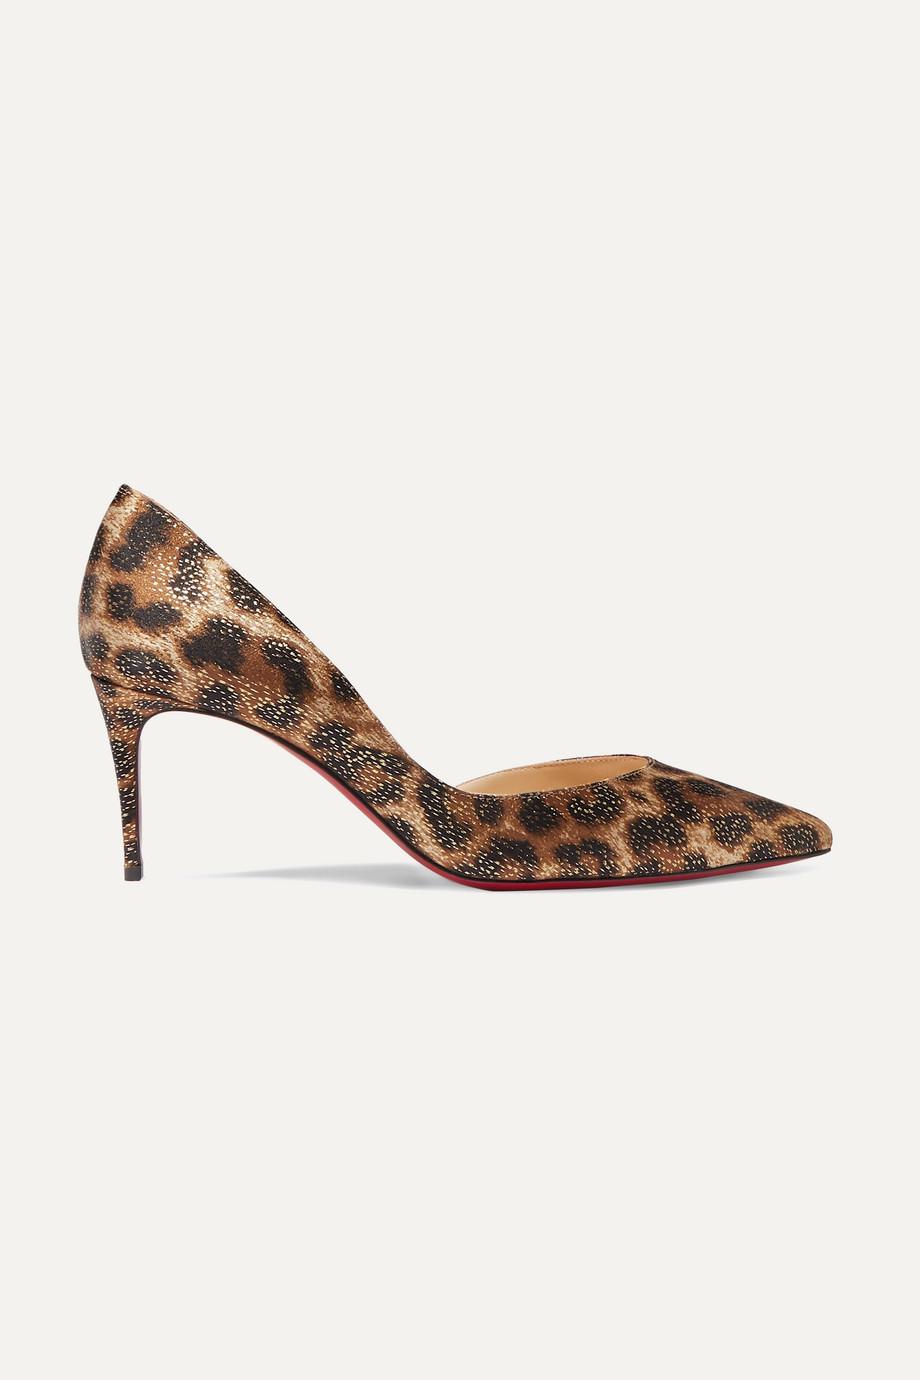 Christian Louboutin Iriza 70 metallic leopard-print satin pumps